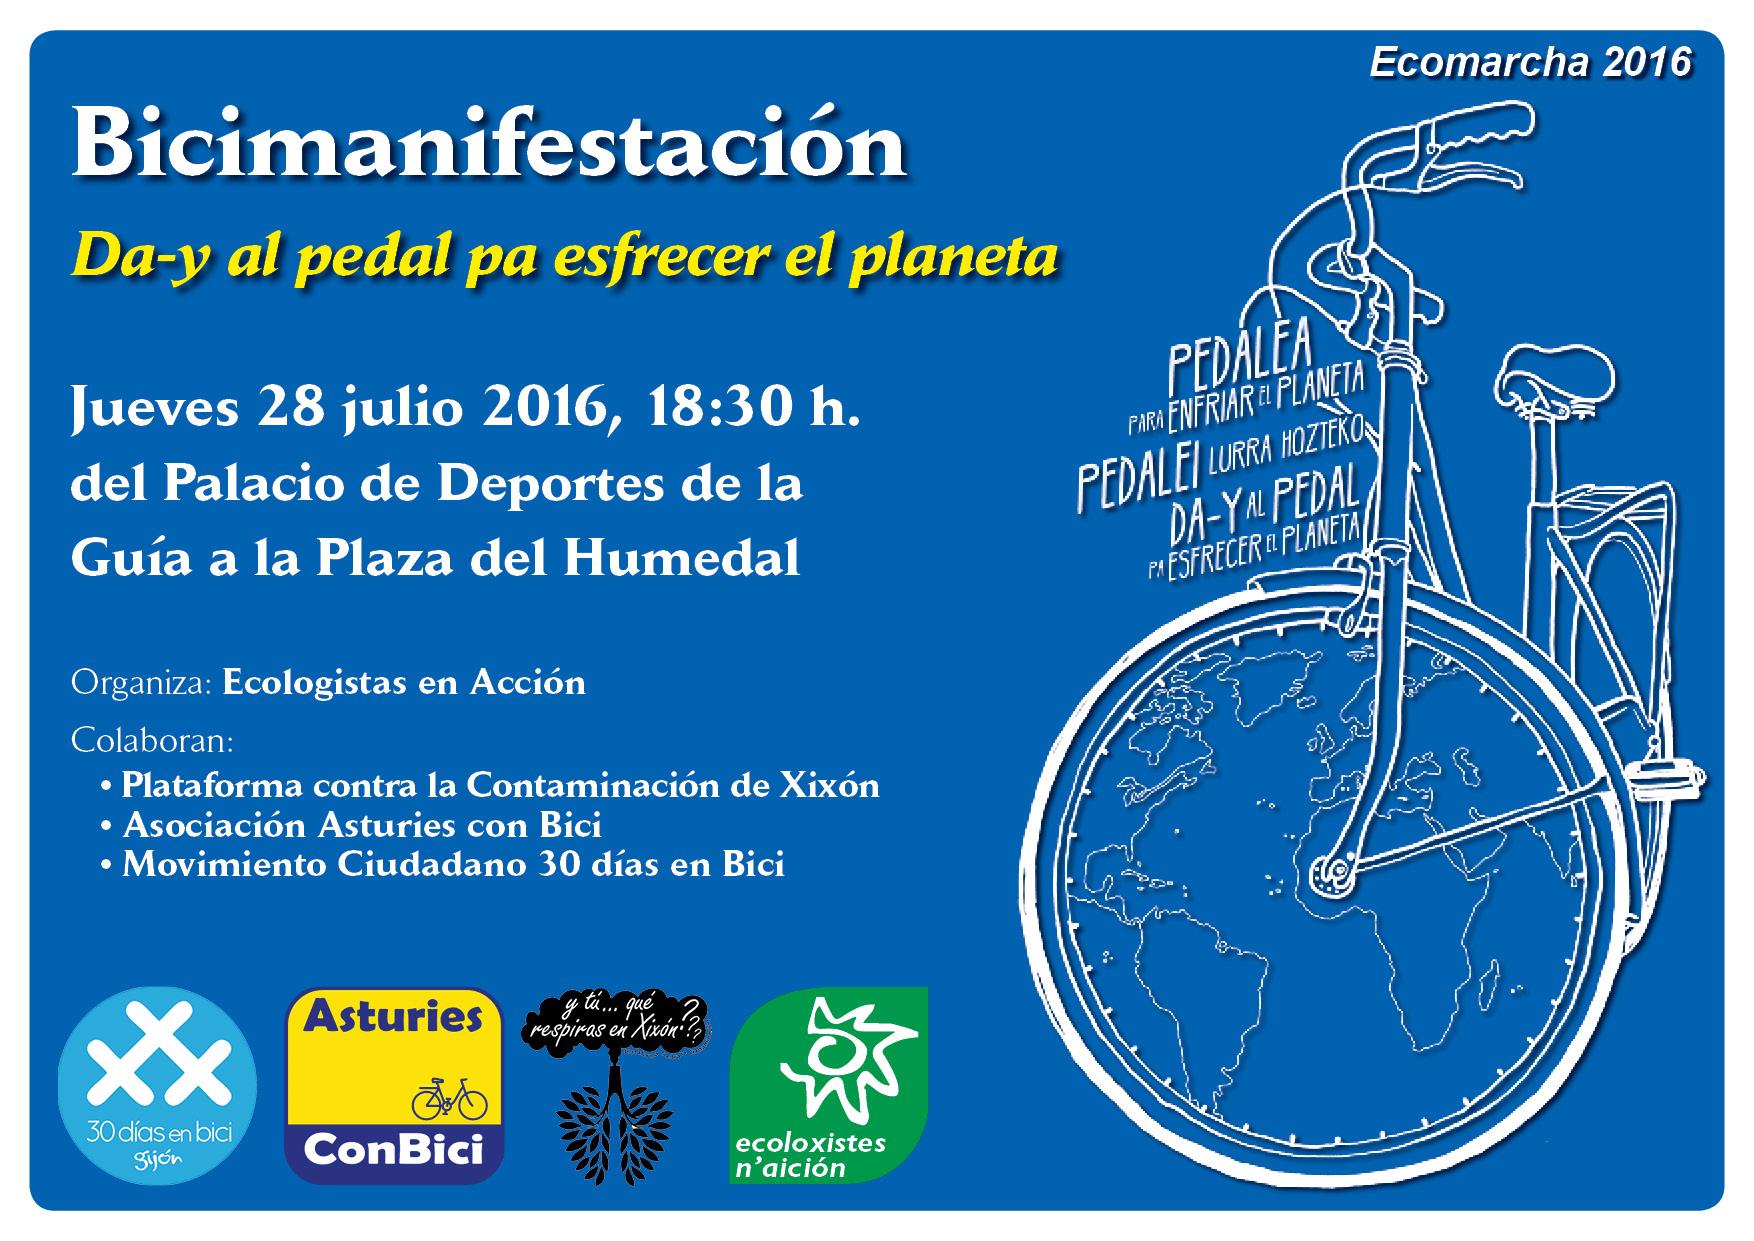 ecomarcha2016-cartel-bici-xixon.jpg